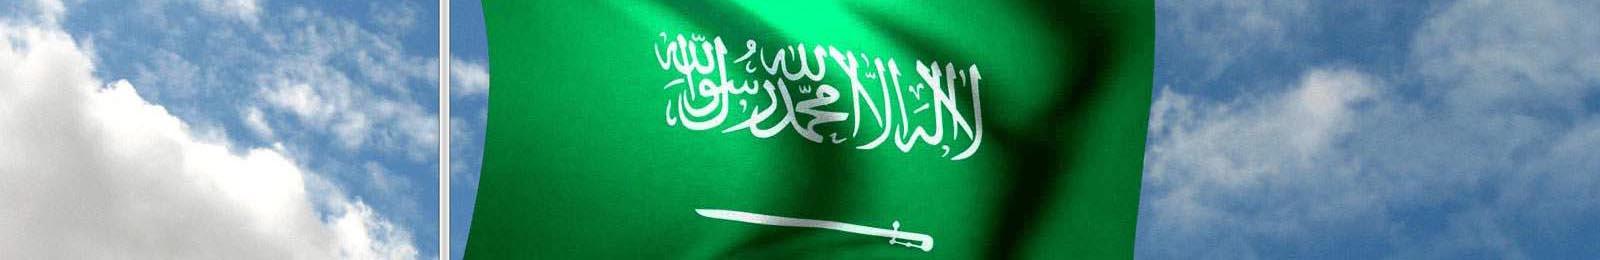 Saudi Visa Application Process Saudi Arabia Visa Online Forms - what is the advisor invitation verification form